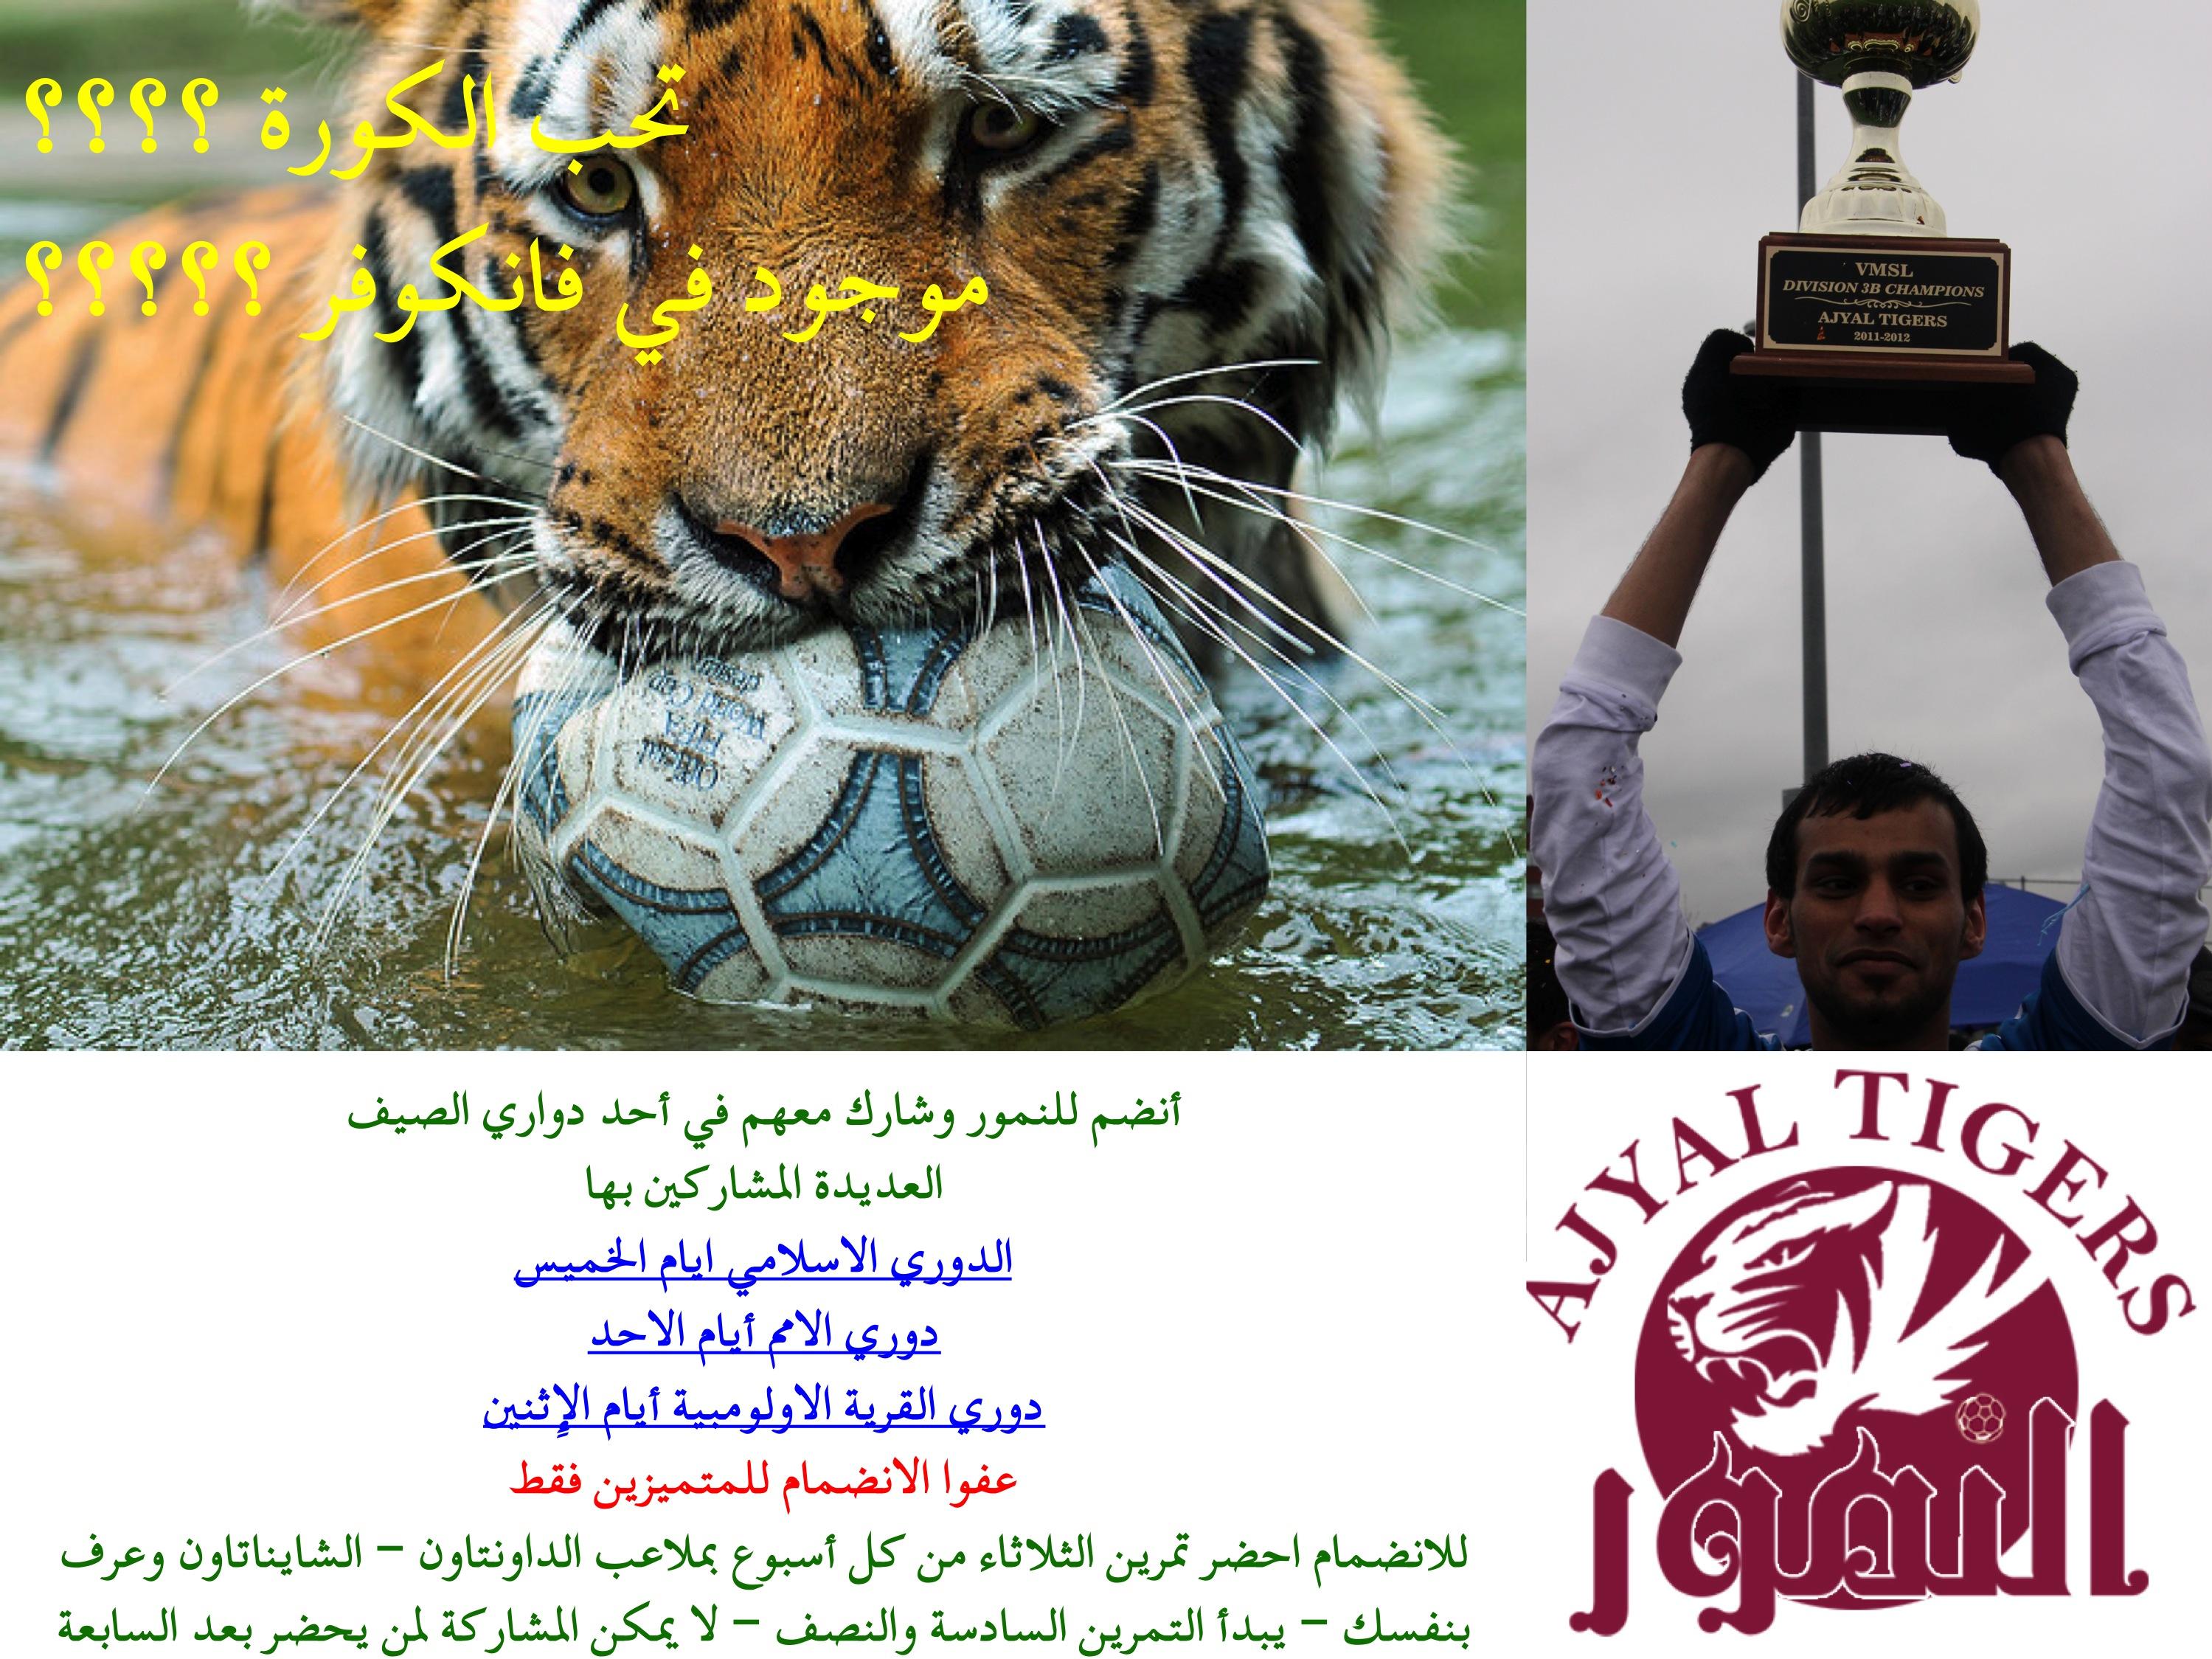 ���� ��� ������ ���� ����  ��������:tigers summer ad.jpg ���������:174 ��������:1.38 �������� �����:21192